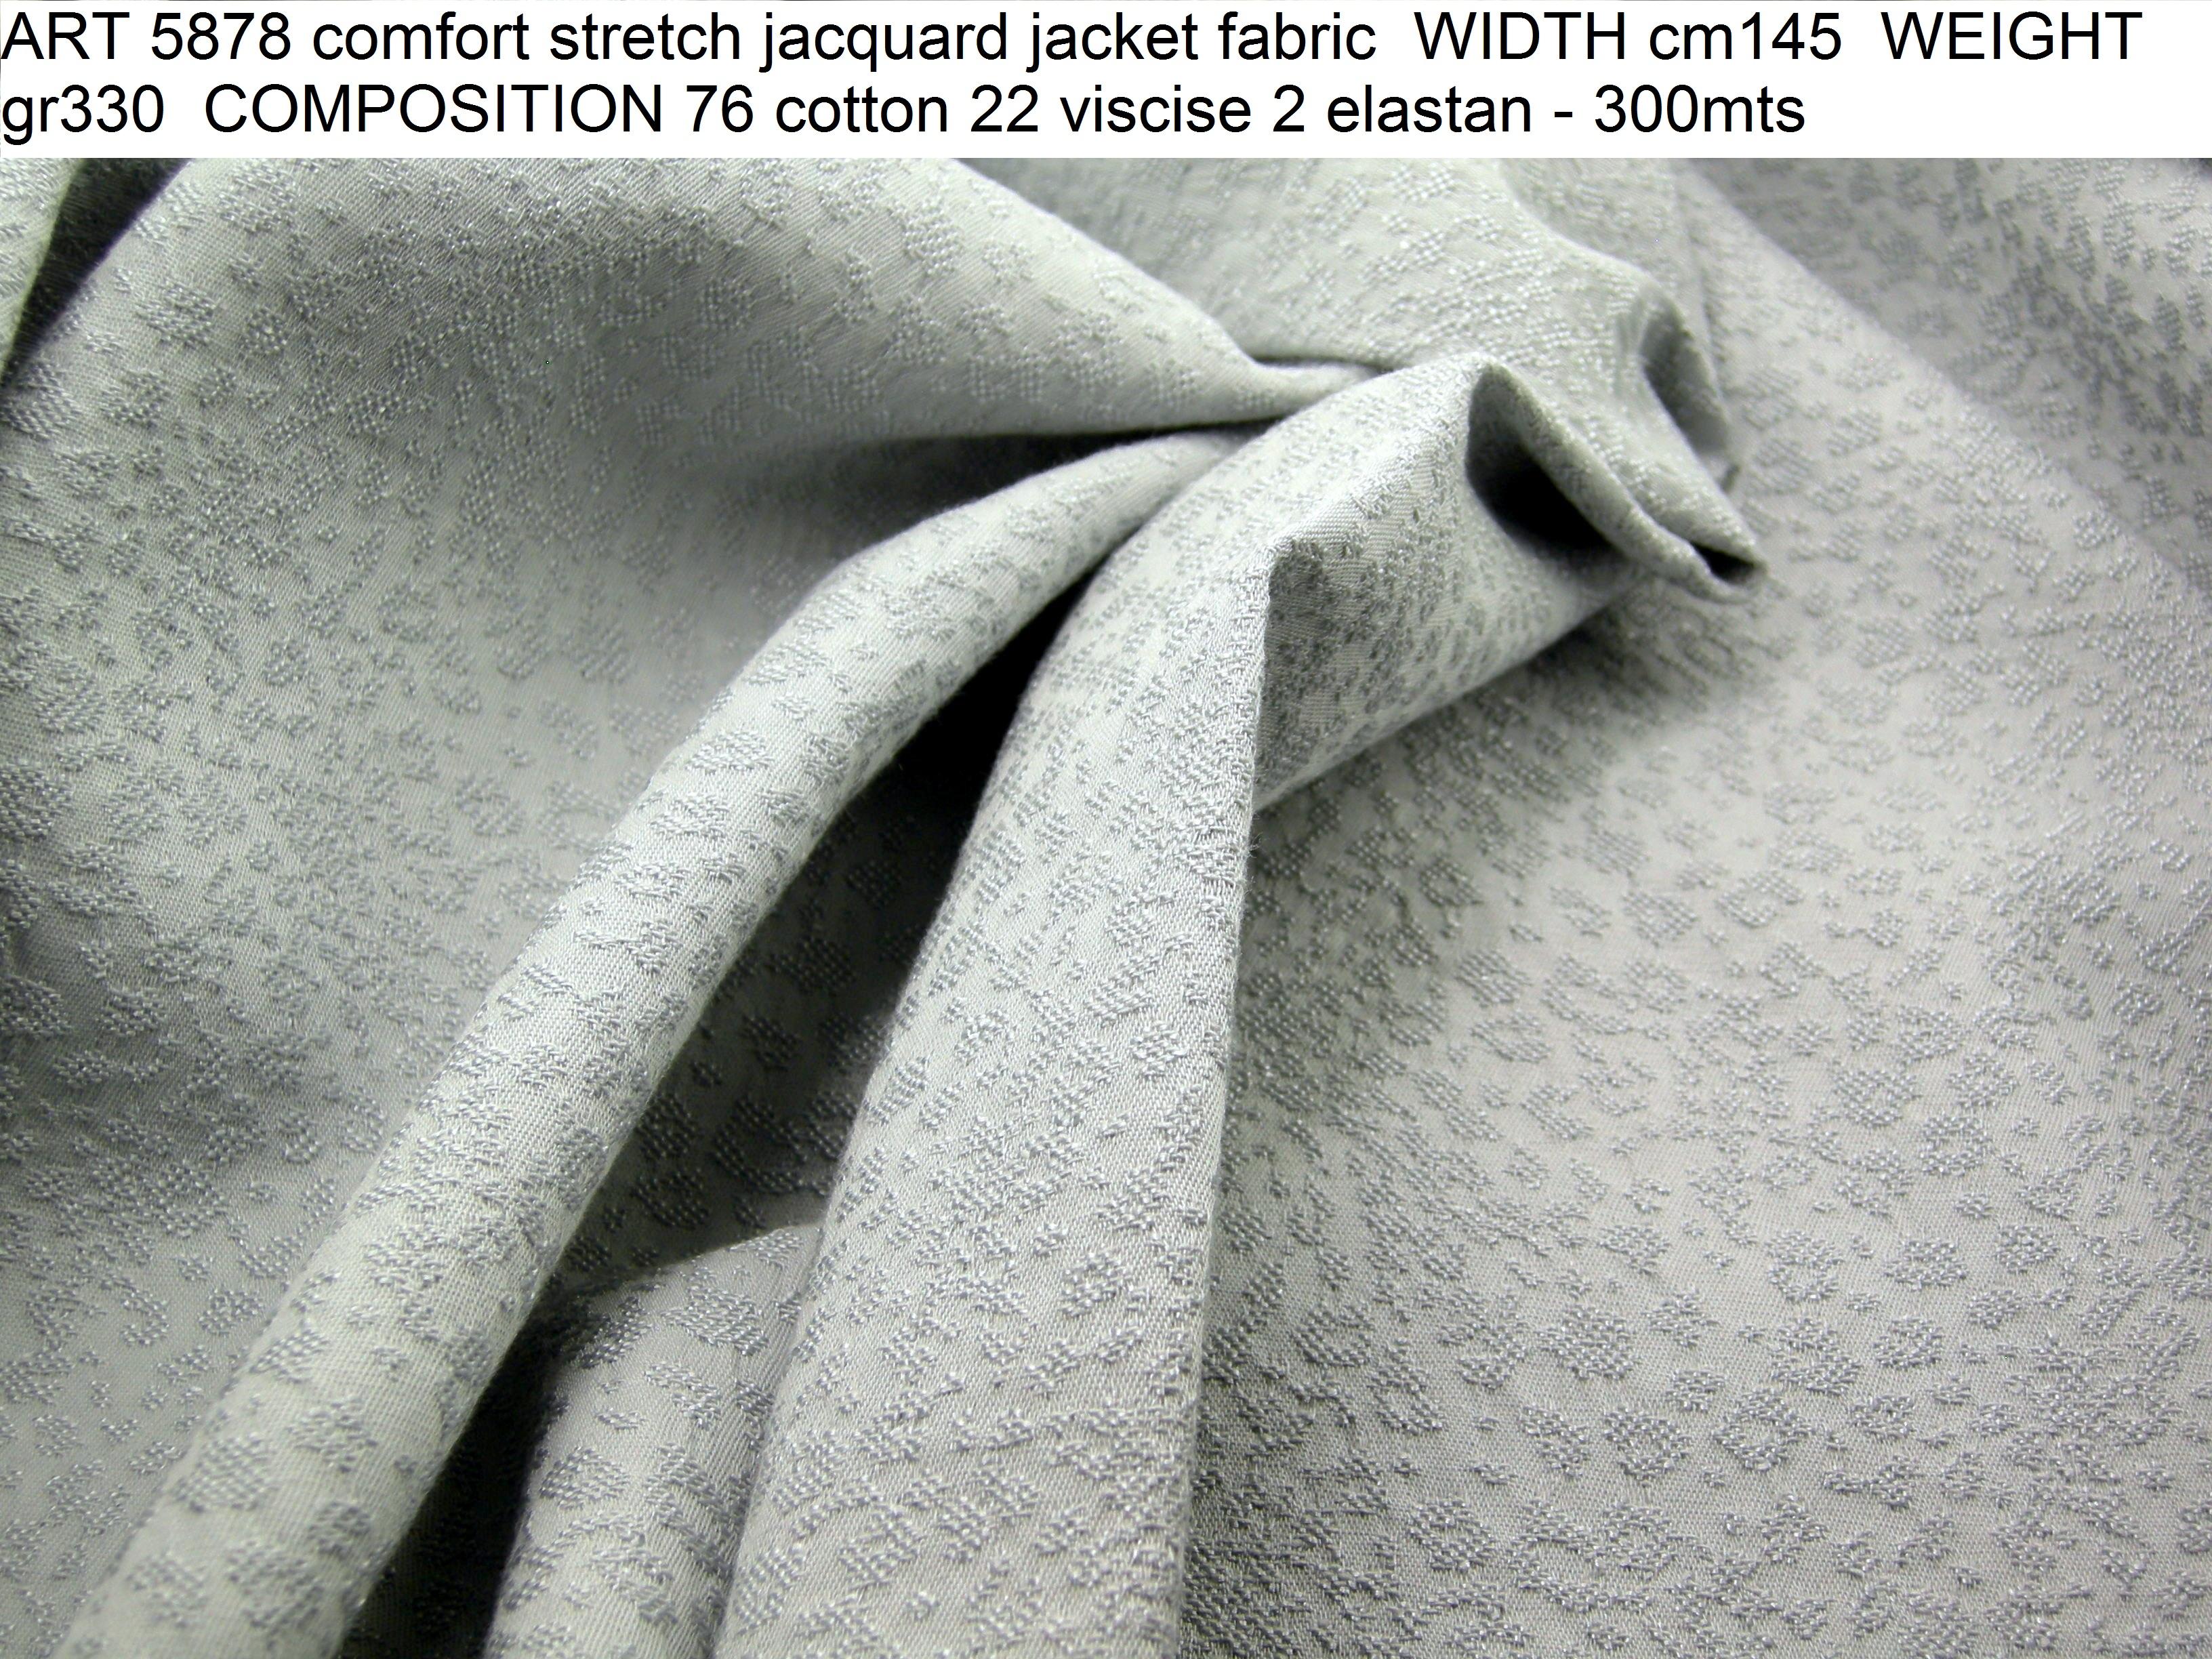 ART 5878 comfort stretch jacquard jacket fabric WIDTH cm145 WEIGHT gr330 COMPOSITION 76 cotton 22 viscose 2 elastan - 300mts